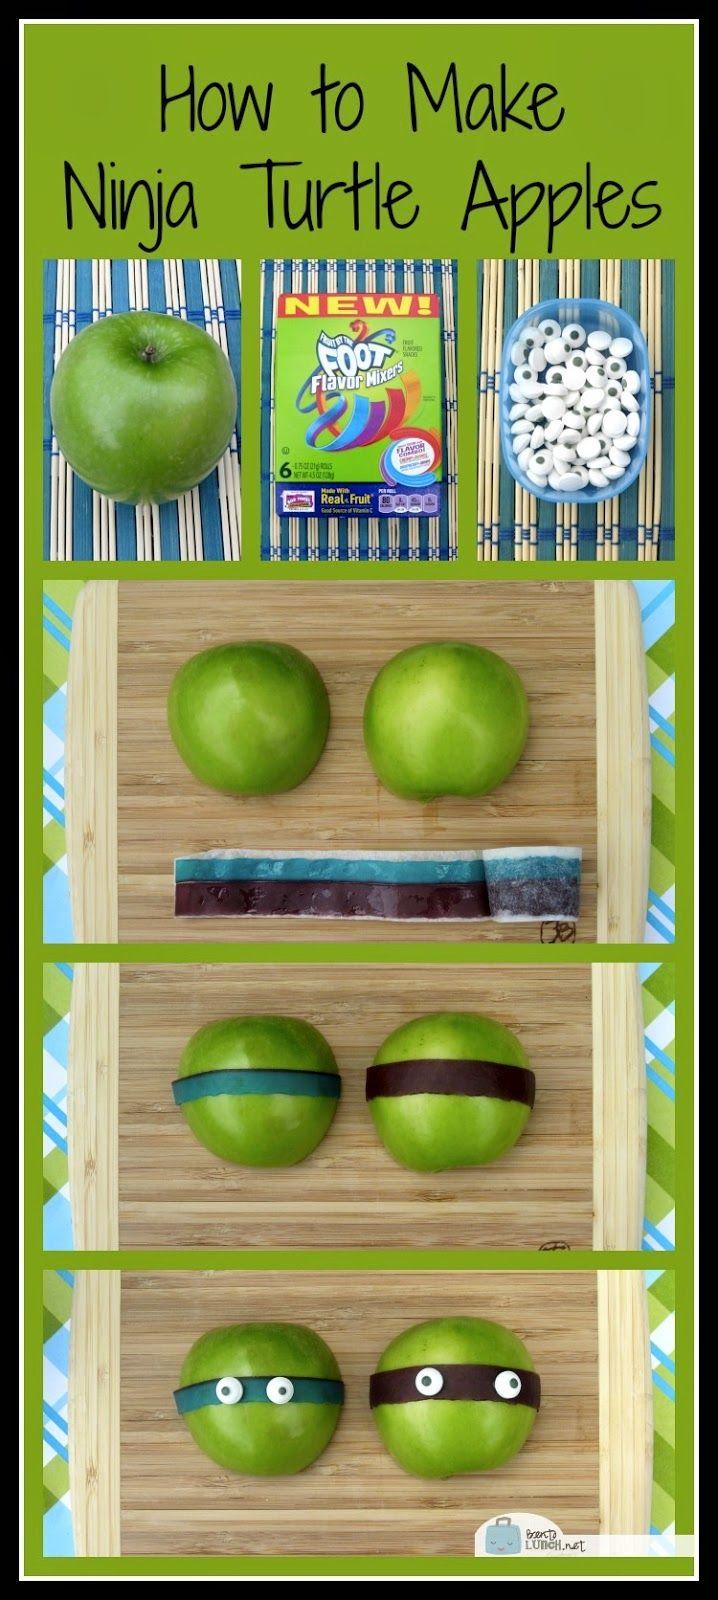 BentoLunch.net - How to Make Teenage Mutant Ninja Turtle Apples (And a Bento!)